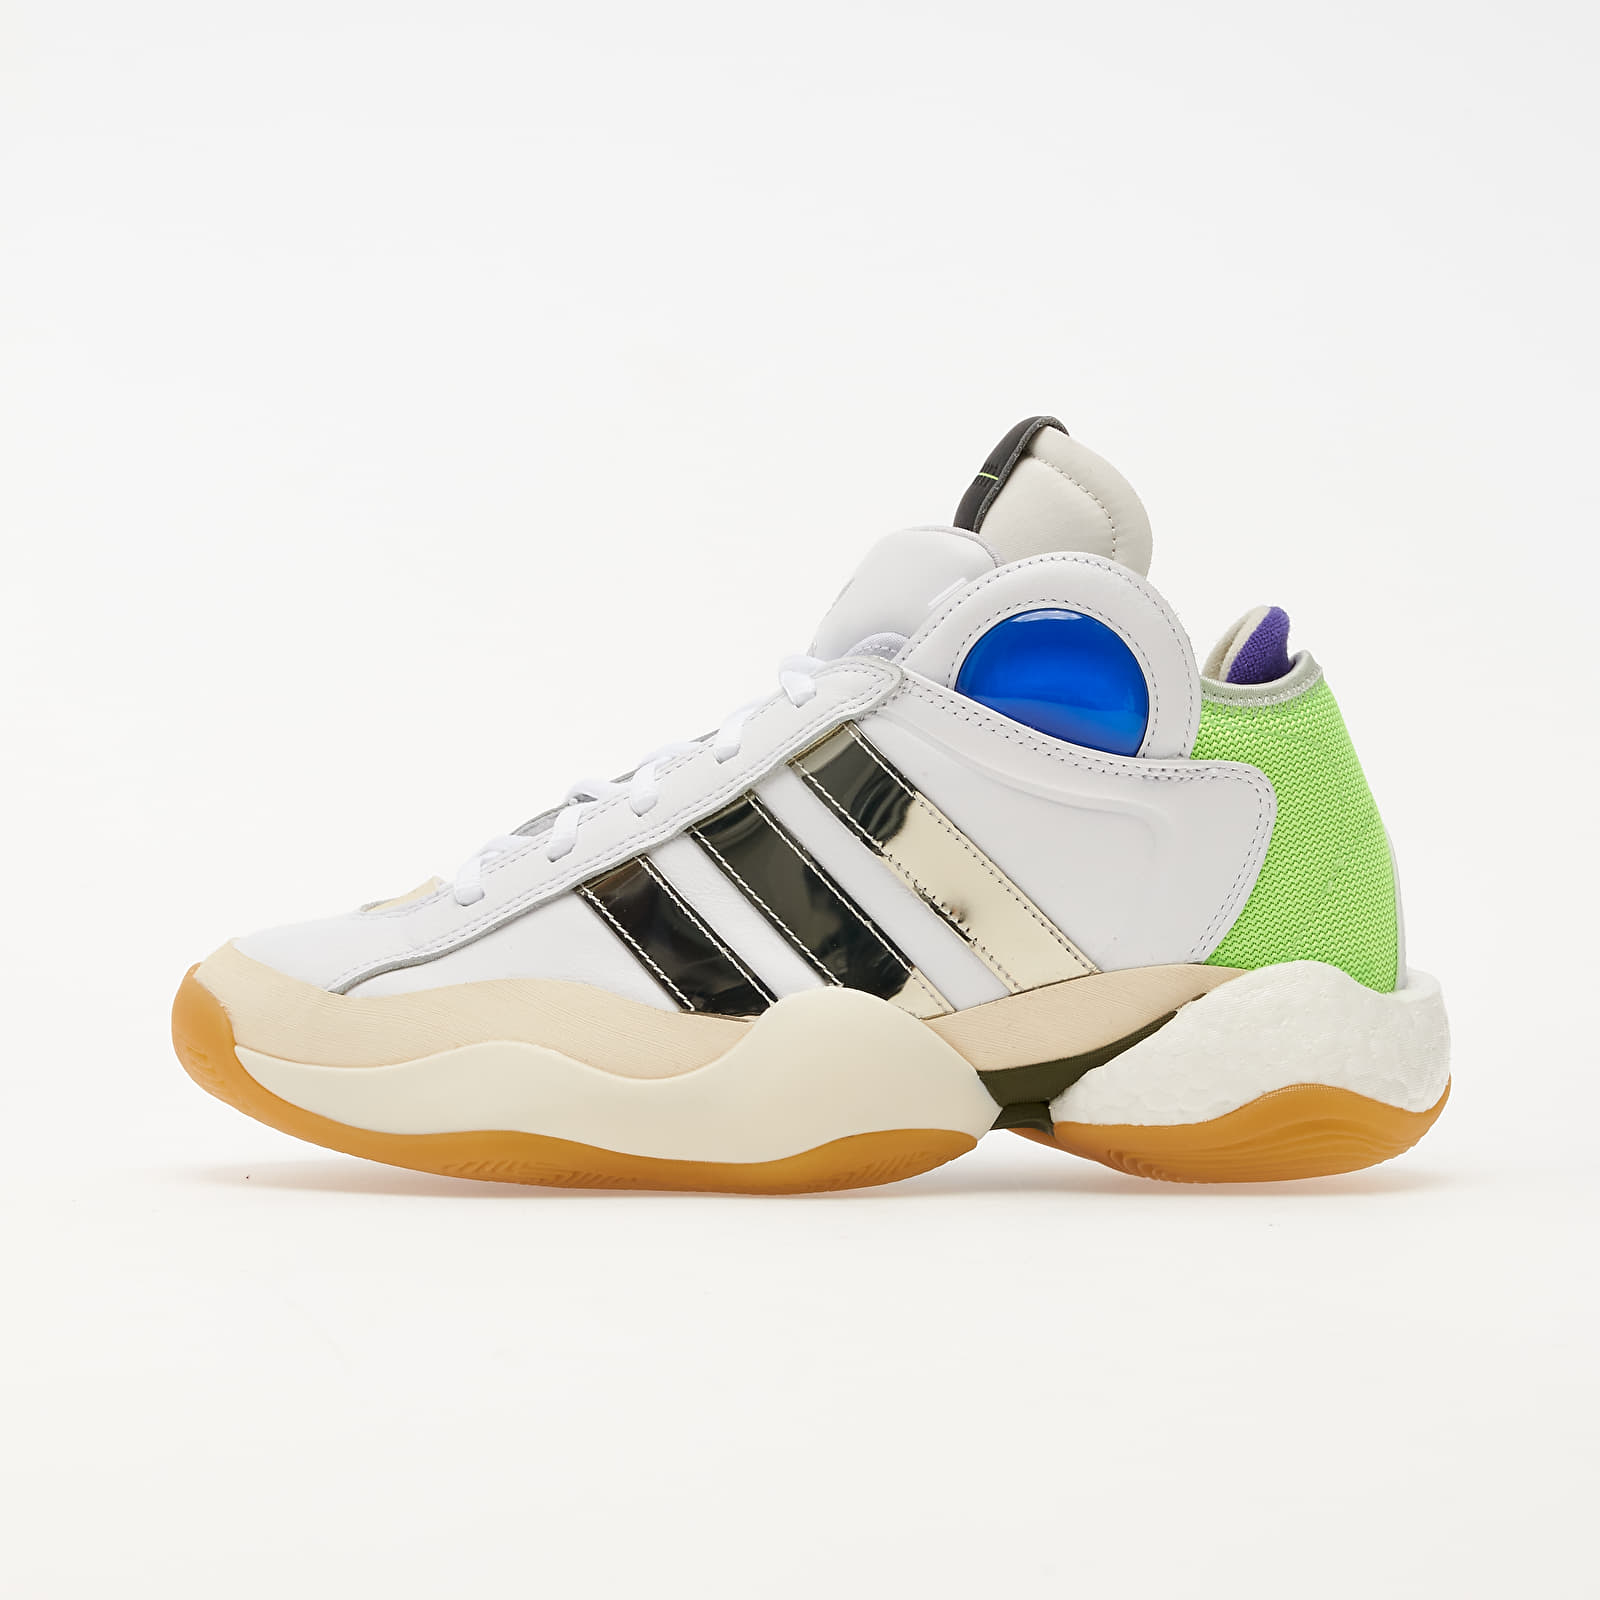 Pánské tenisky a boty adidas x Sankuanz Crazy BYW Ftwr White/ Silver Met./ Gum 3